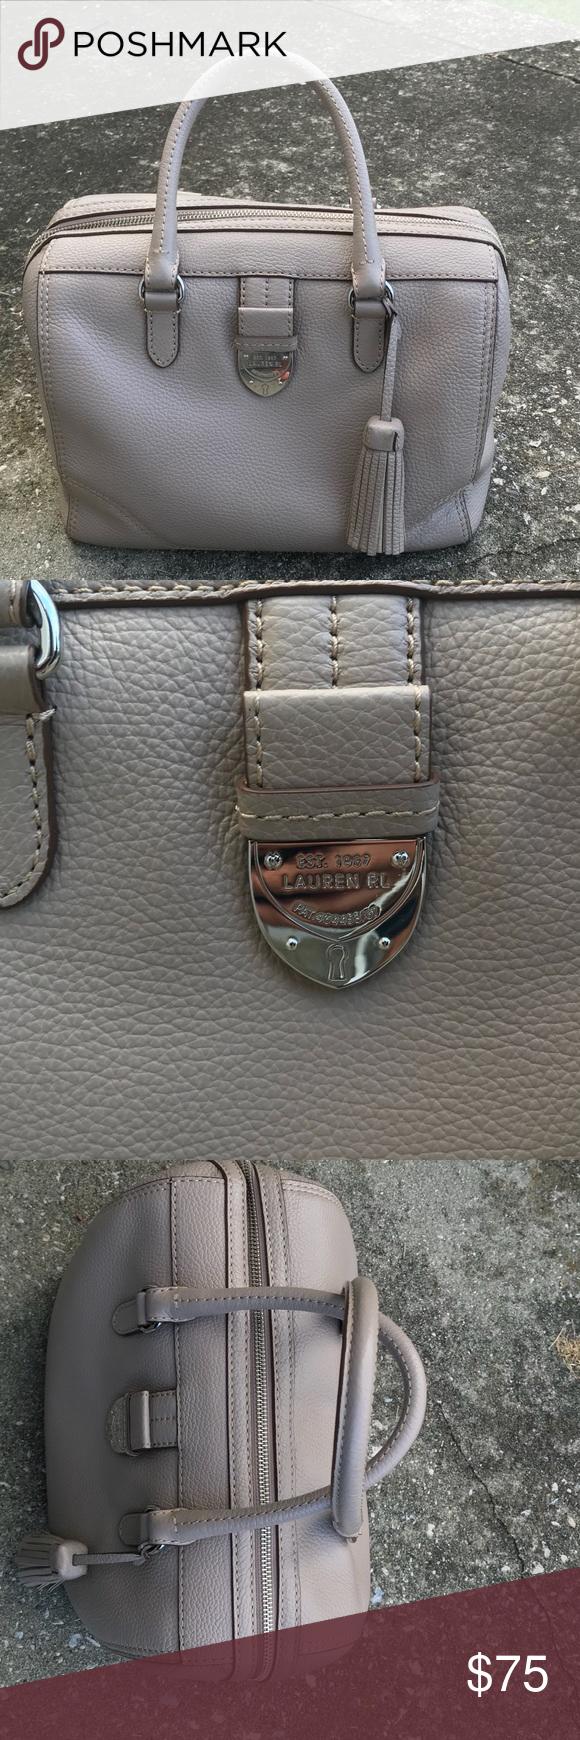 I just added this listing on Poshmark  Lauren Ralph Lauren leather bowler  bag with tassel.  shopmycloset  poshmark  fashion  shopping  style  forsale  ... bef6646ab9